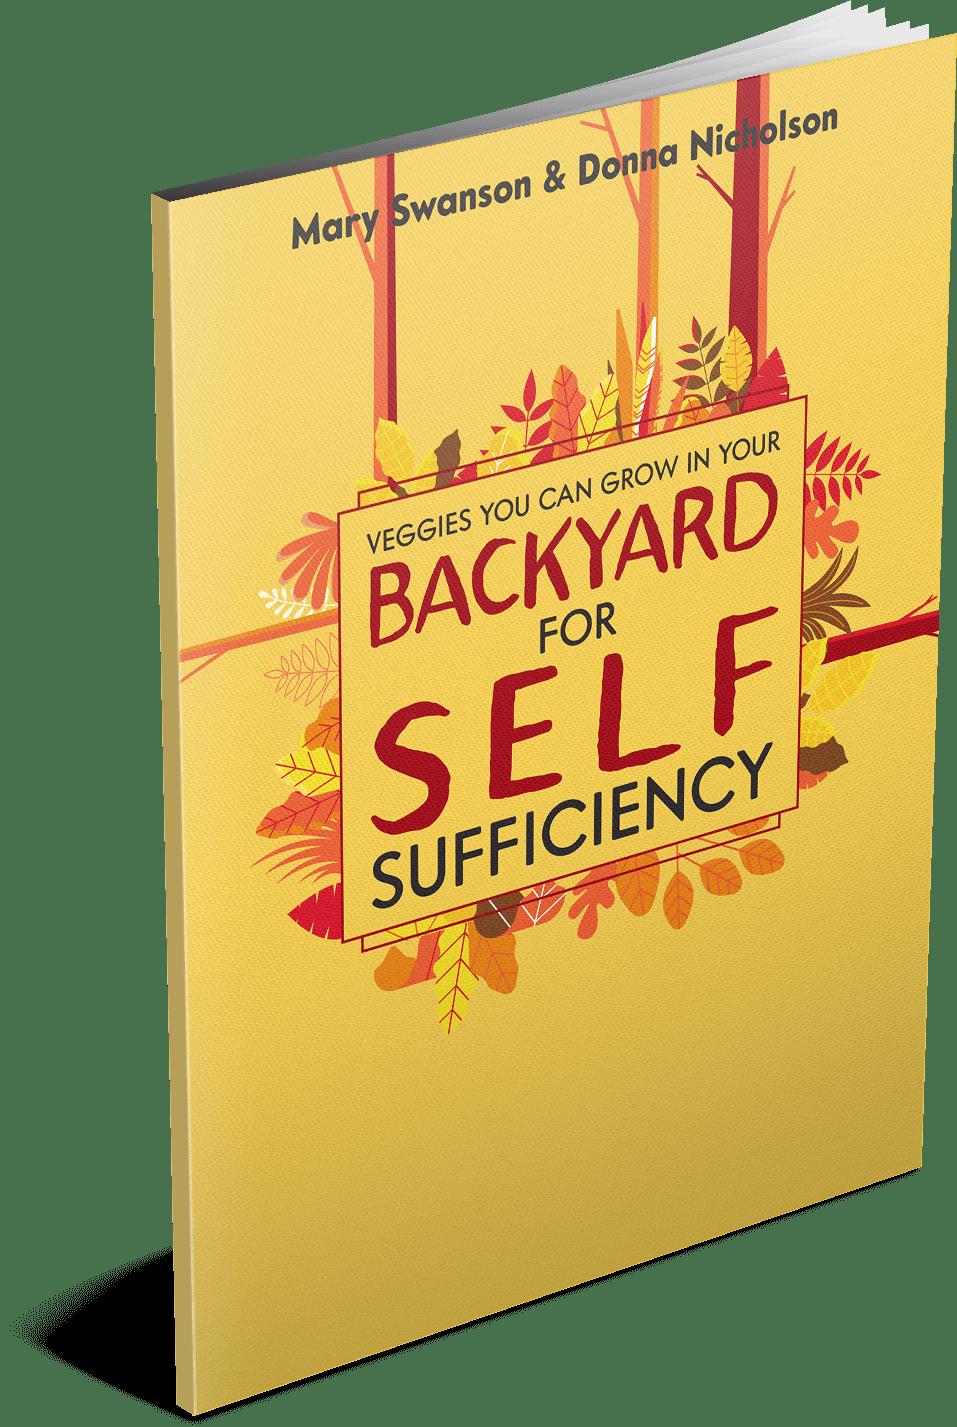 Backyard for Self Sufficiency